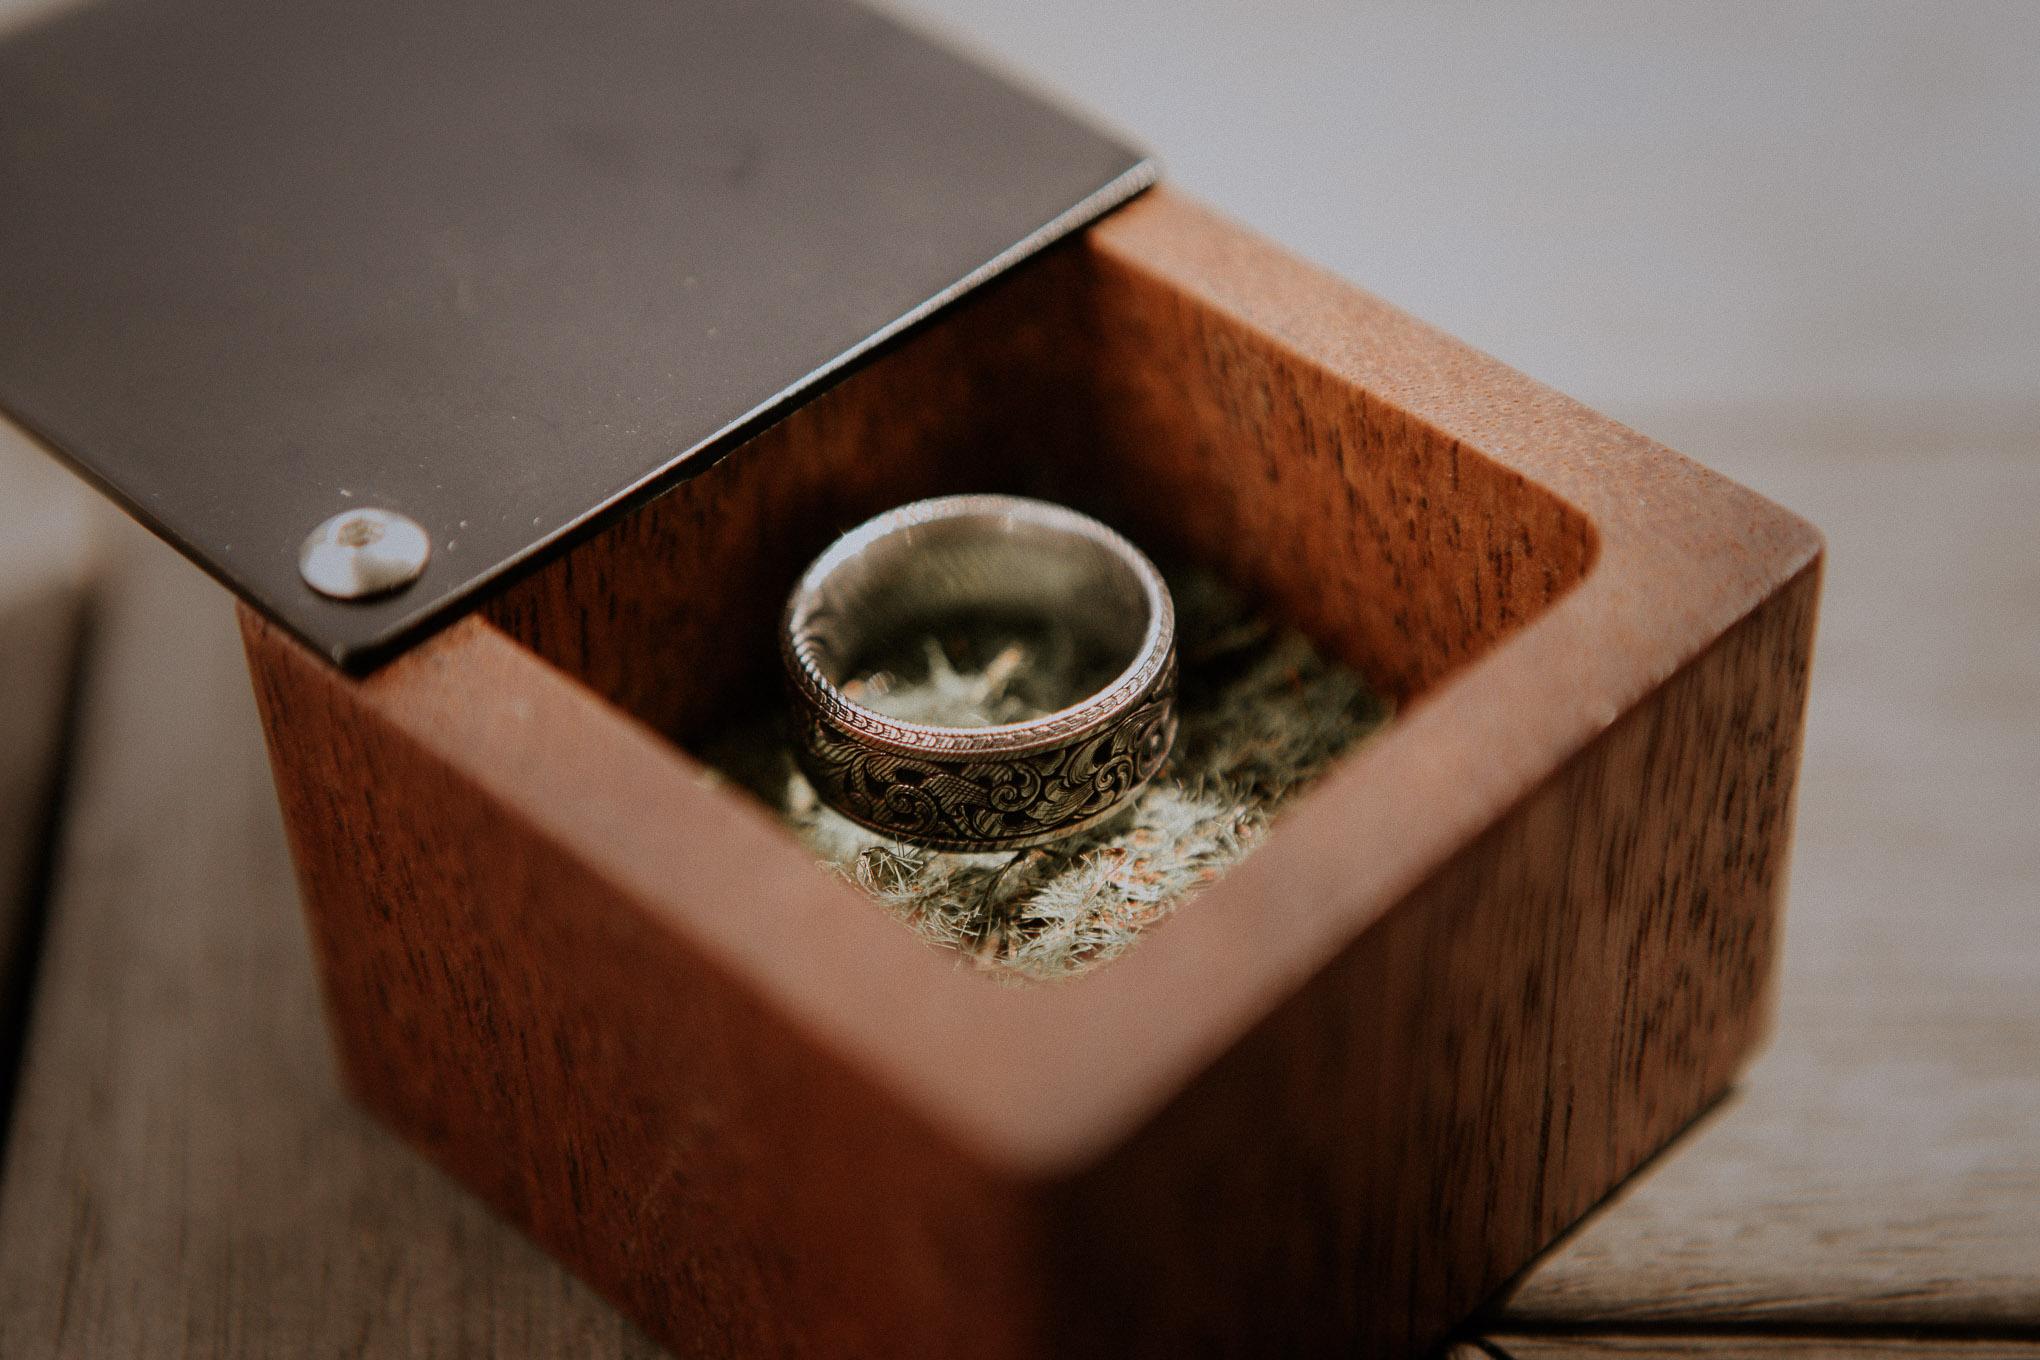 Groom's wedding ring in a custom timber box